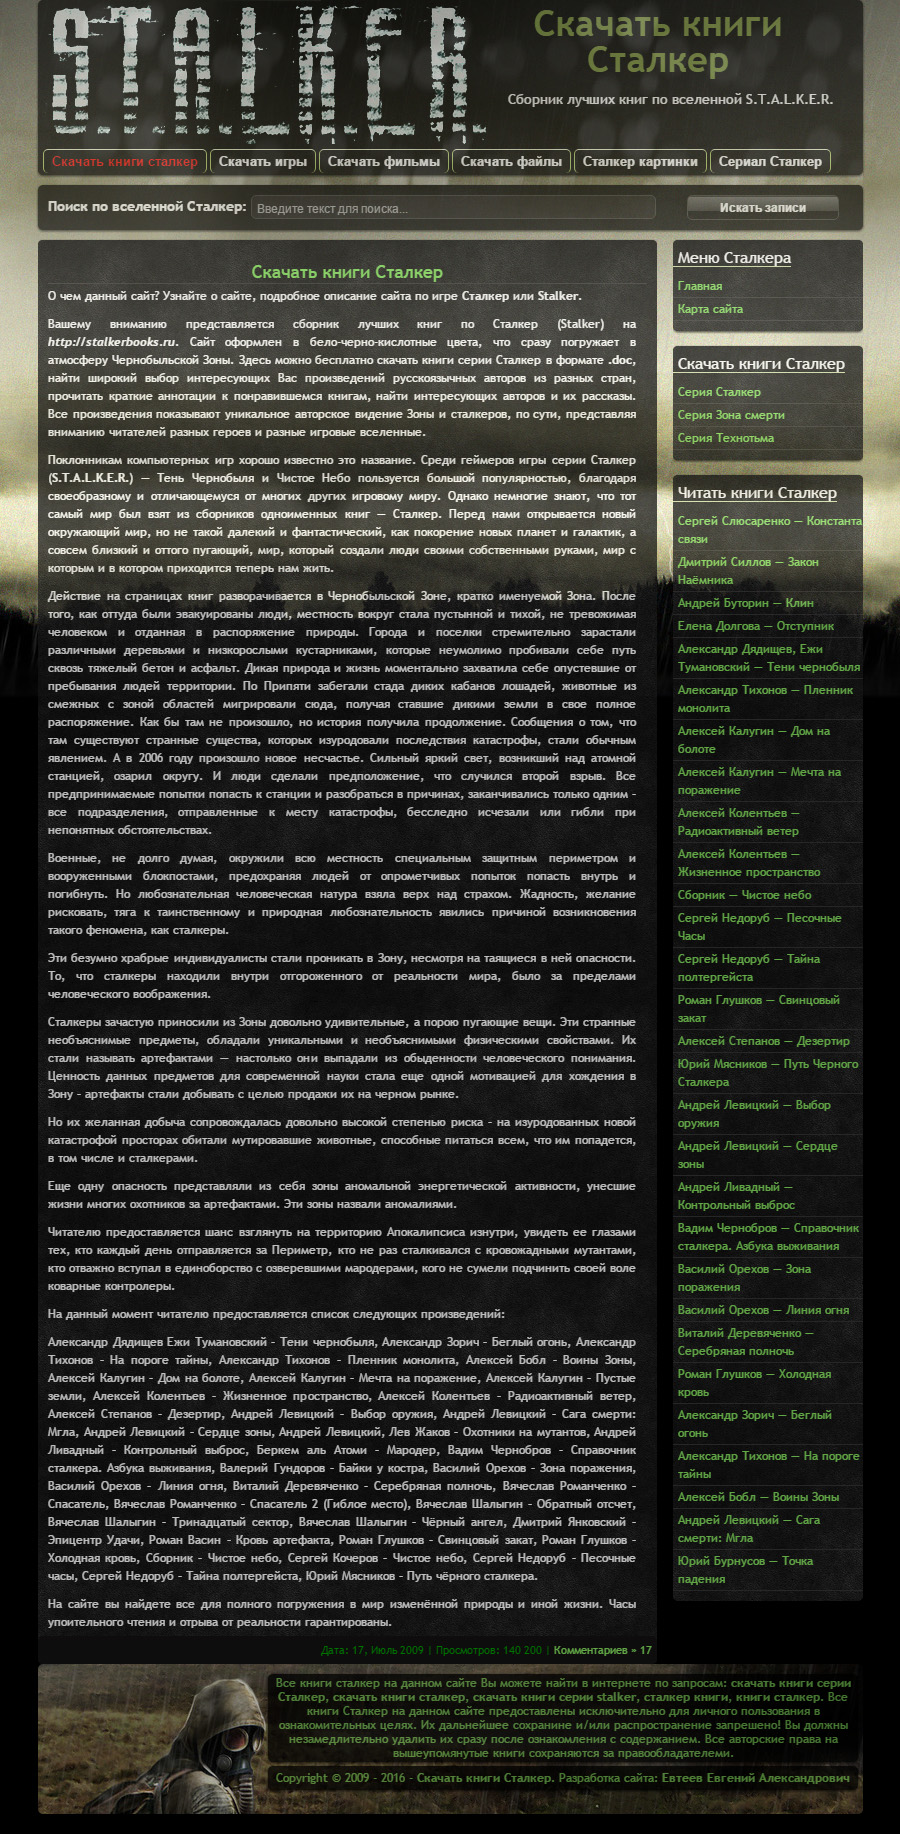 S.T.A.L.K.E.R - Книгарня - книги в форматах fb2, txt, epub скачать бесплатно библиотека - www.poegosledam.ru